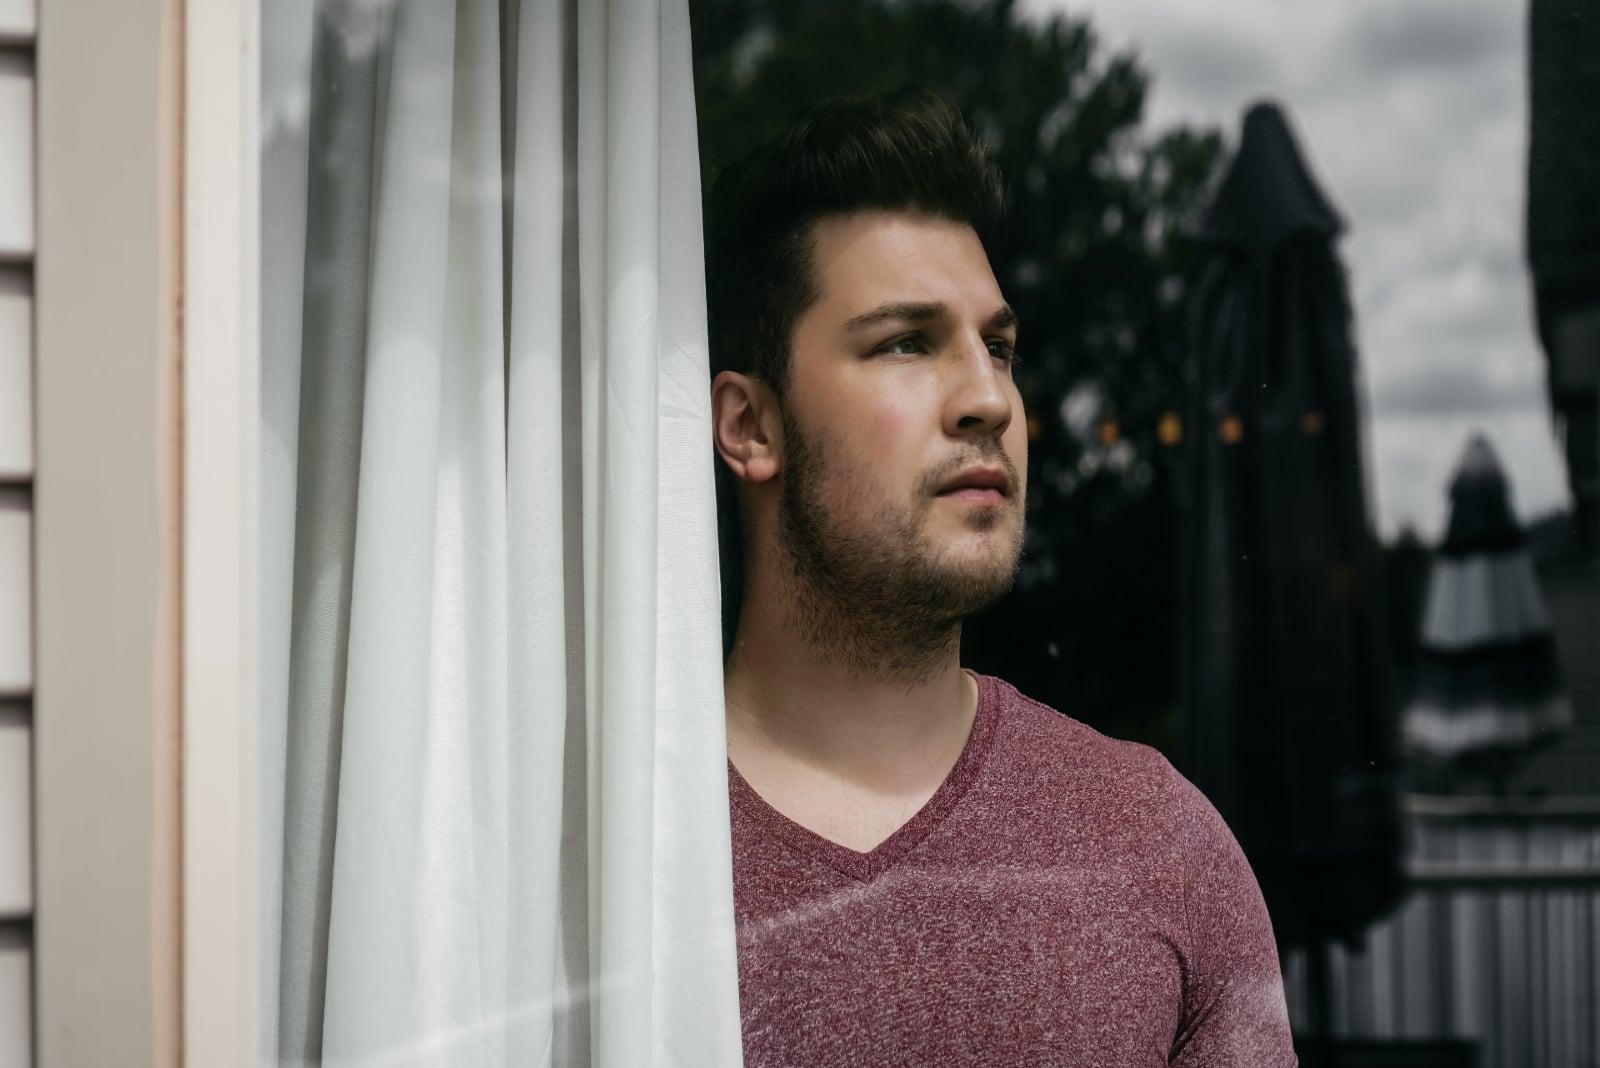 man looking through window while standing near white curtain